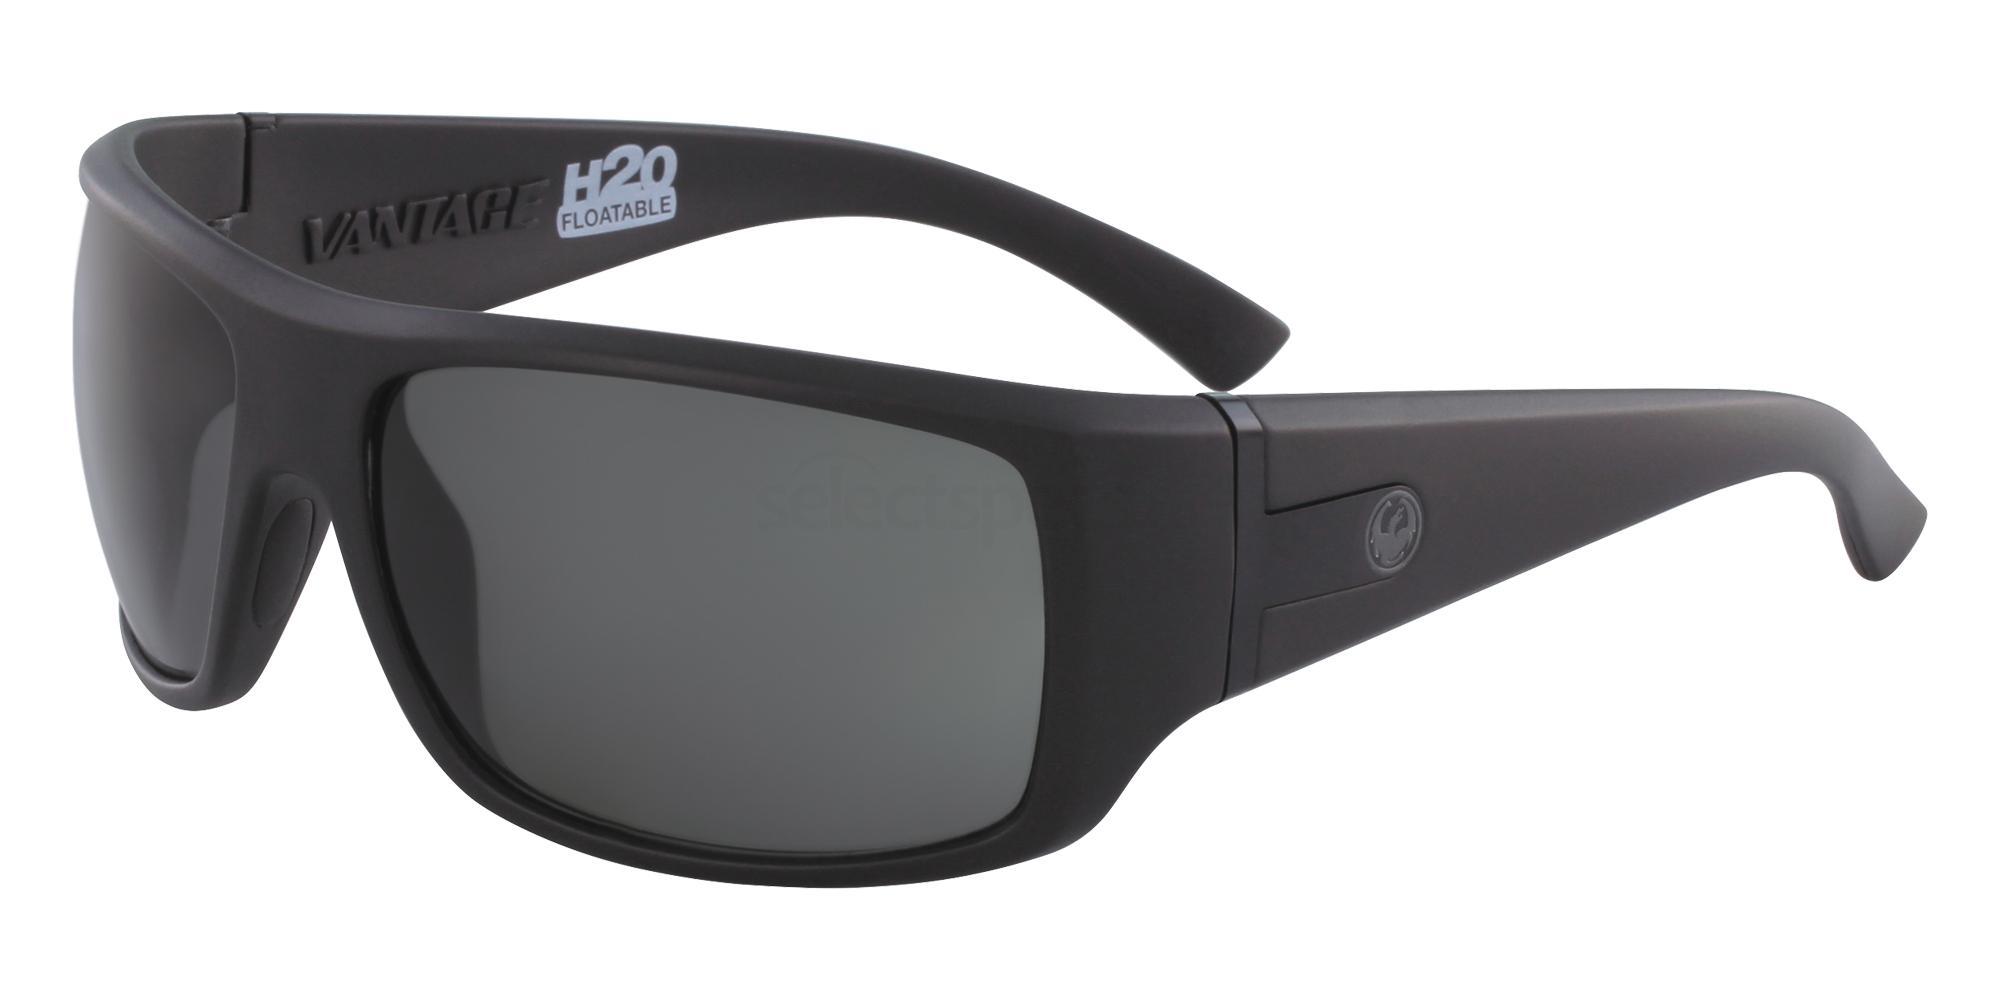 002 DR VANTAGE LL H2O NON POLAR Sunglasses, Dragon